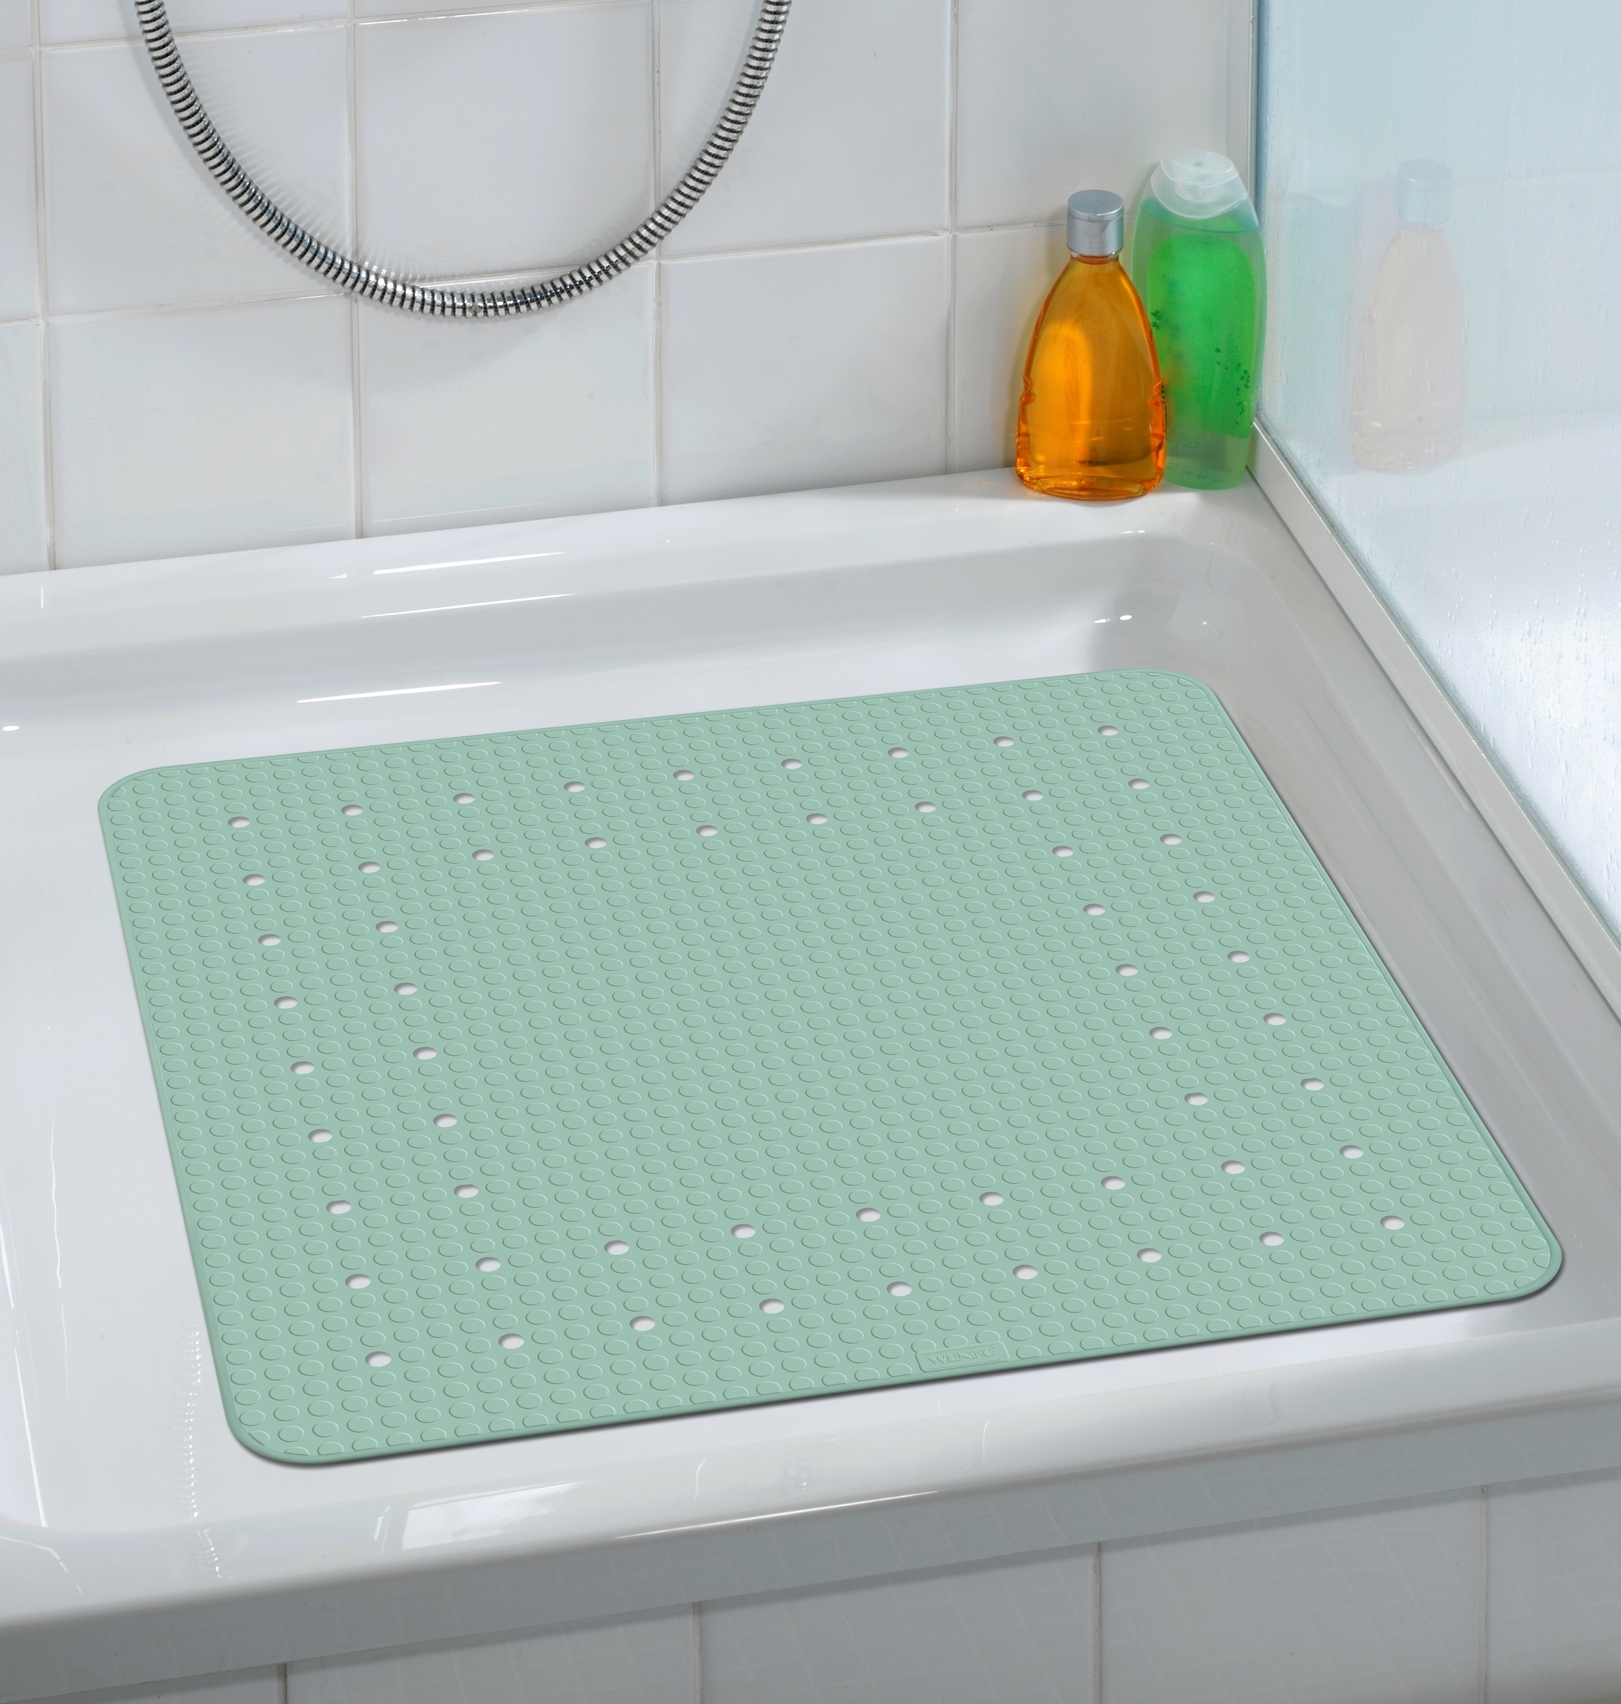 Covoras pentru baie antiderapant, din TPR, Mirasol Verde Mint, 54 x 54 cm imagine